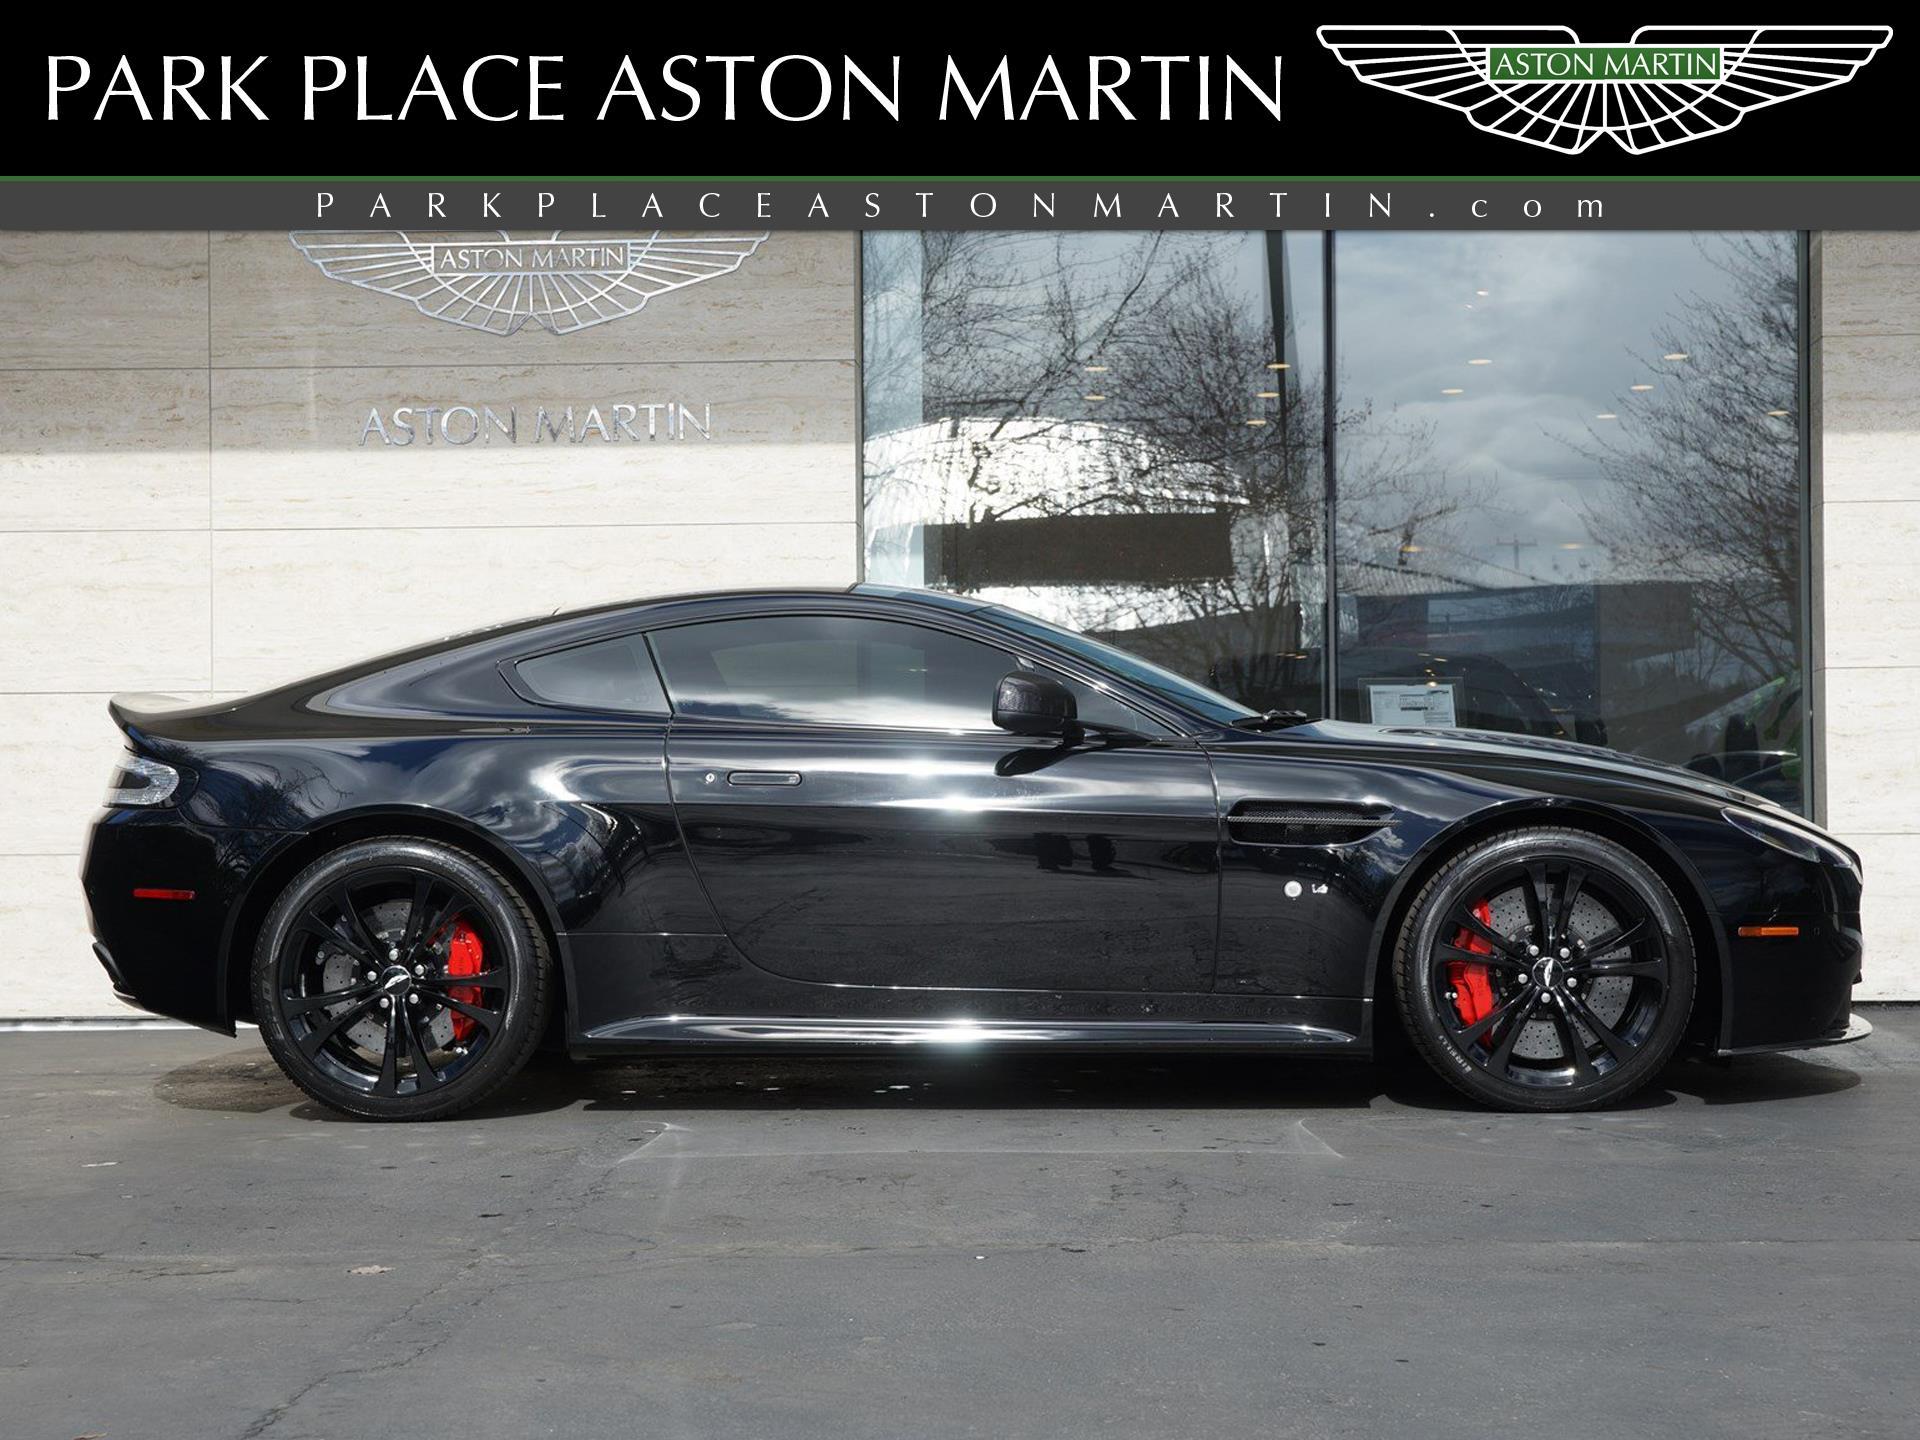 Aston Martin Lagonda   Seminuevos   Vehicle Details   V12 Vantage S Coupe    SCFEKBCRXF